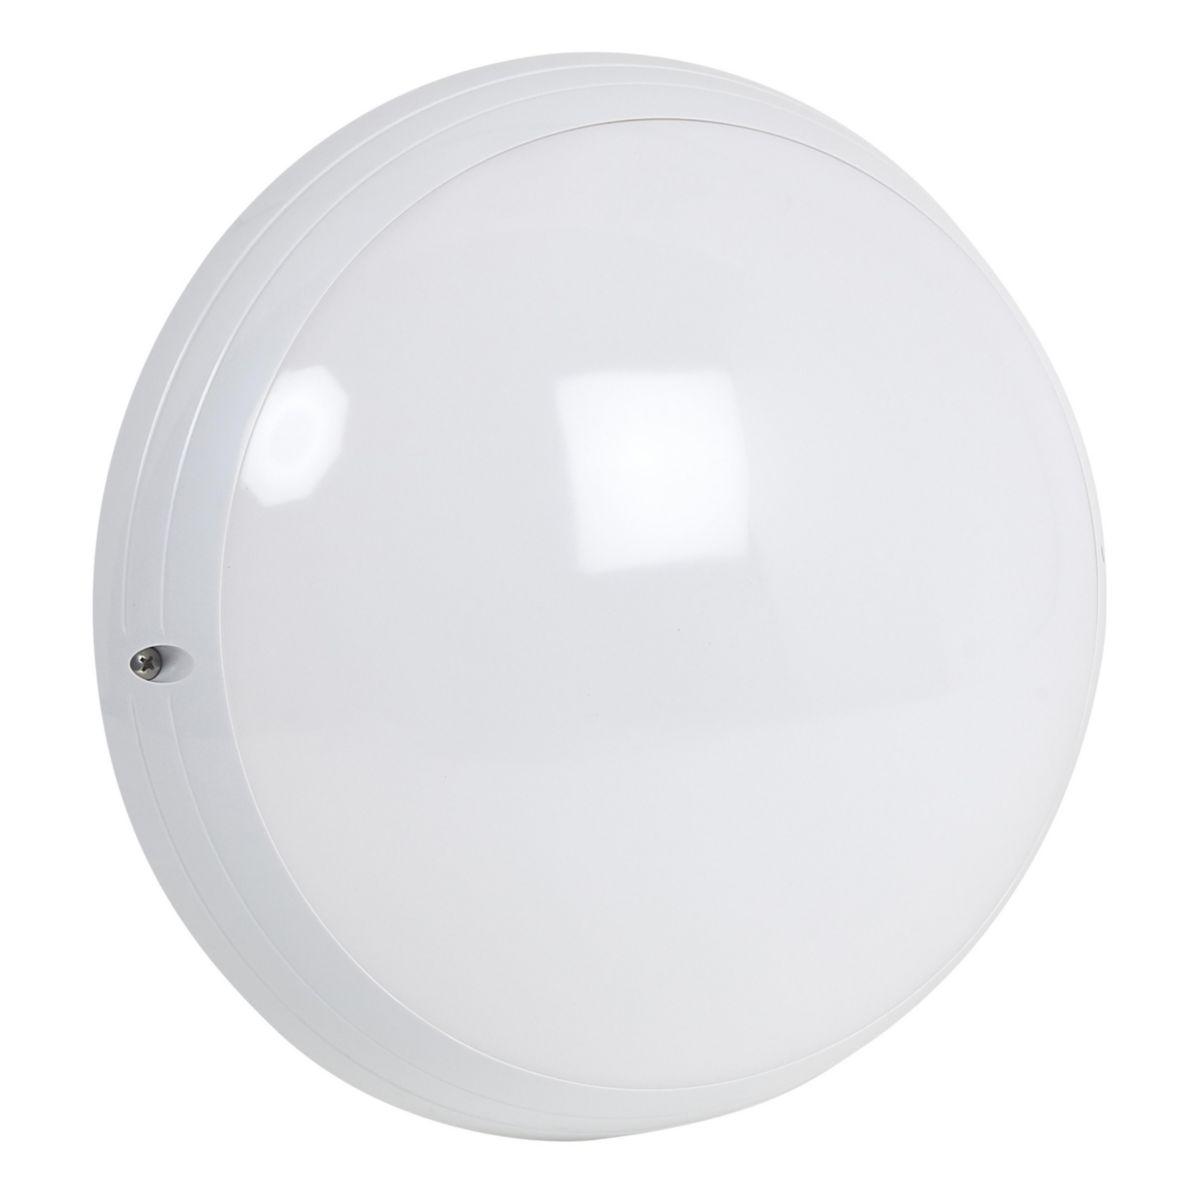 Hublot Astreo 800lm 4000k standard blanc - Réf. SL532180